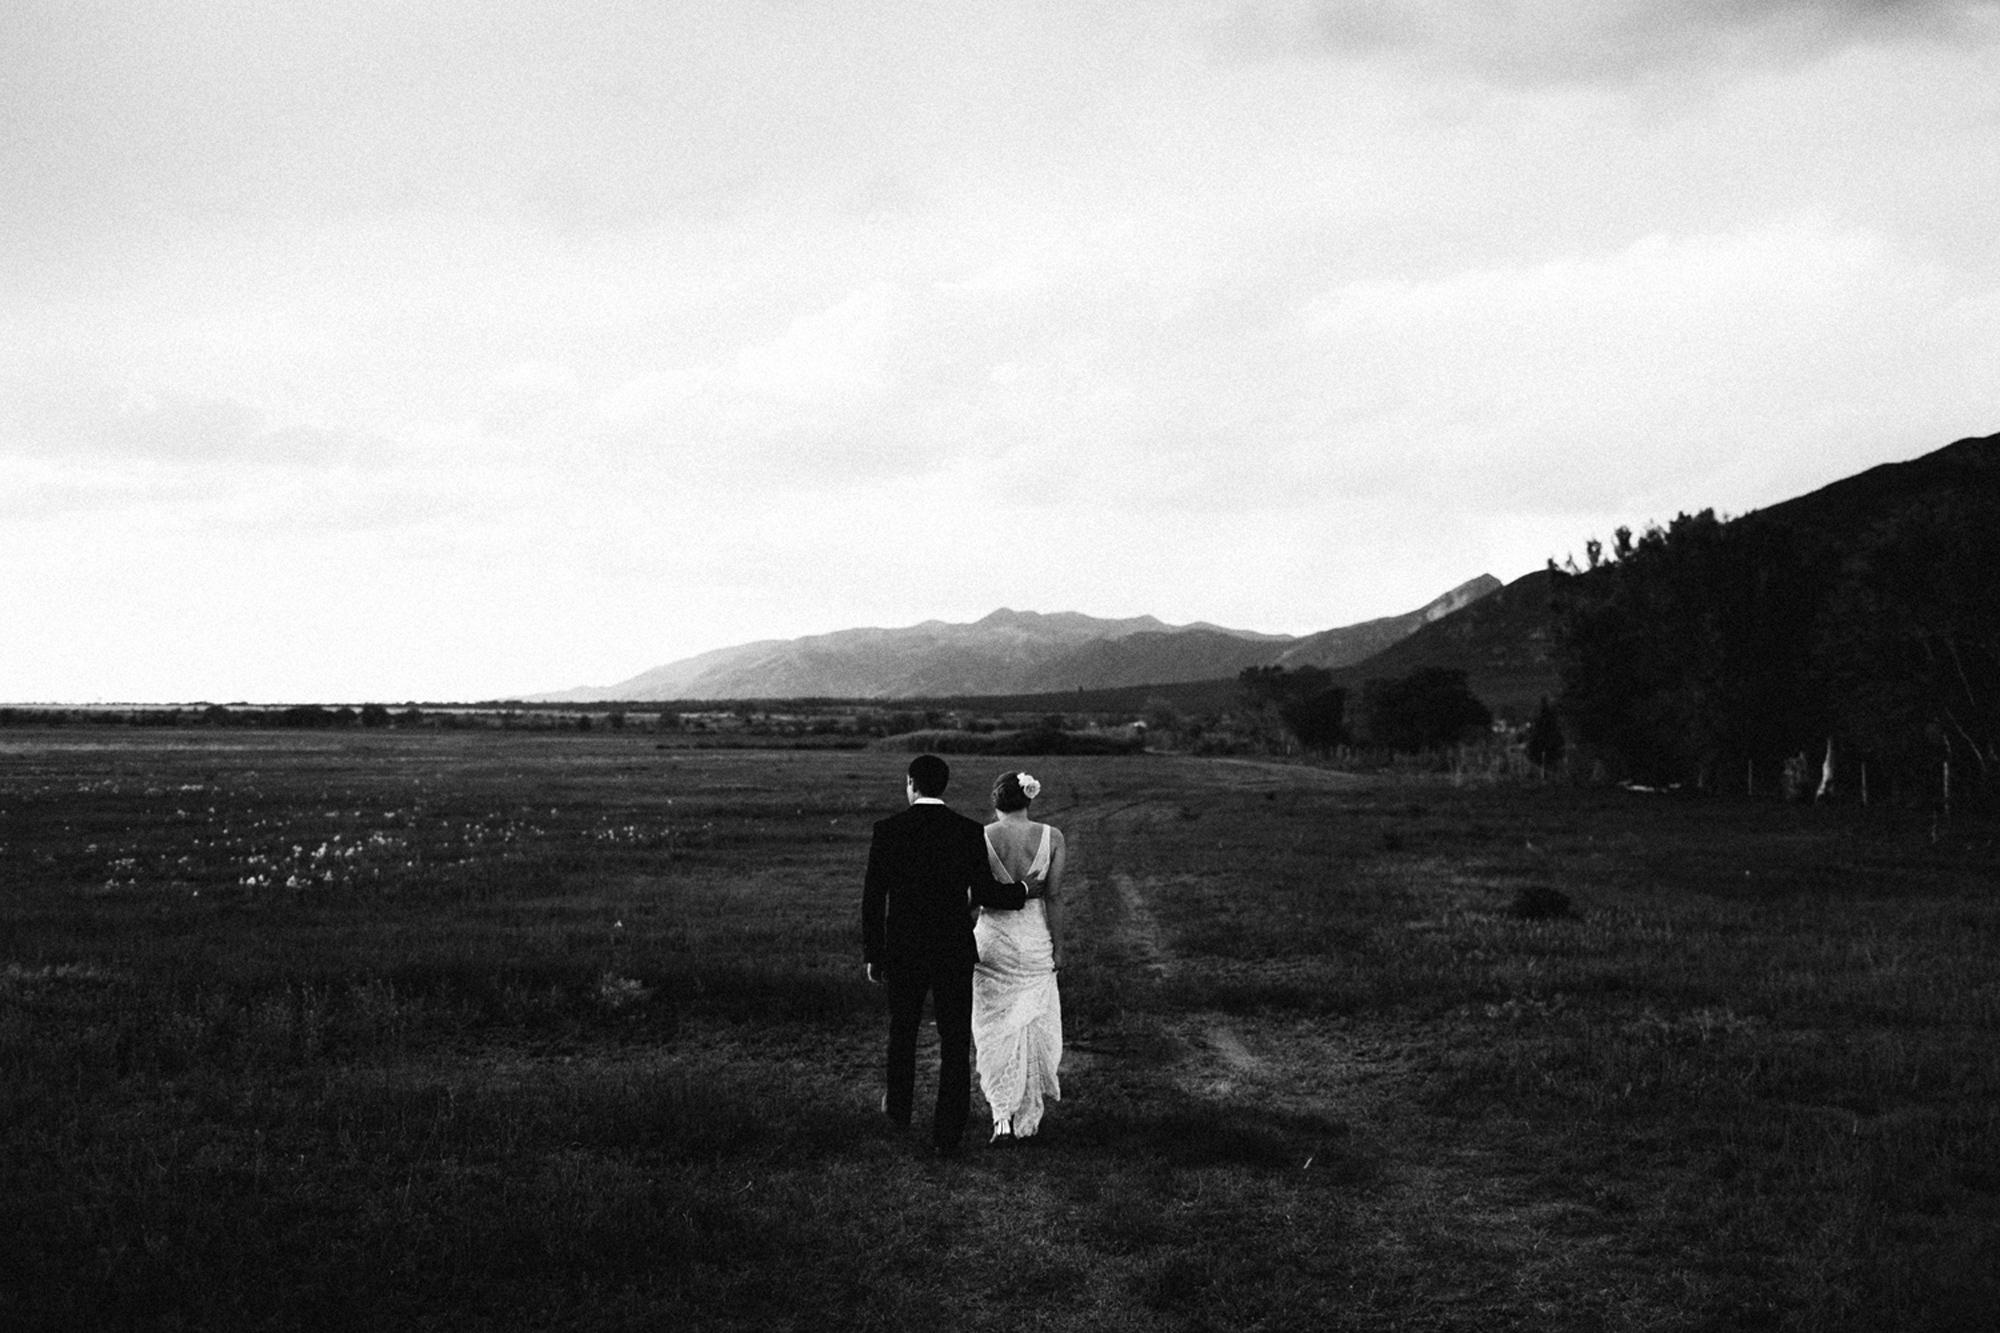 044-taos-wedding.jpg